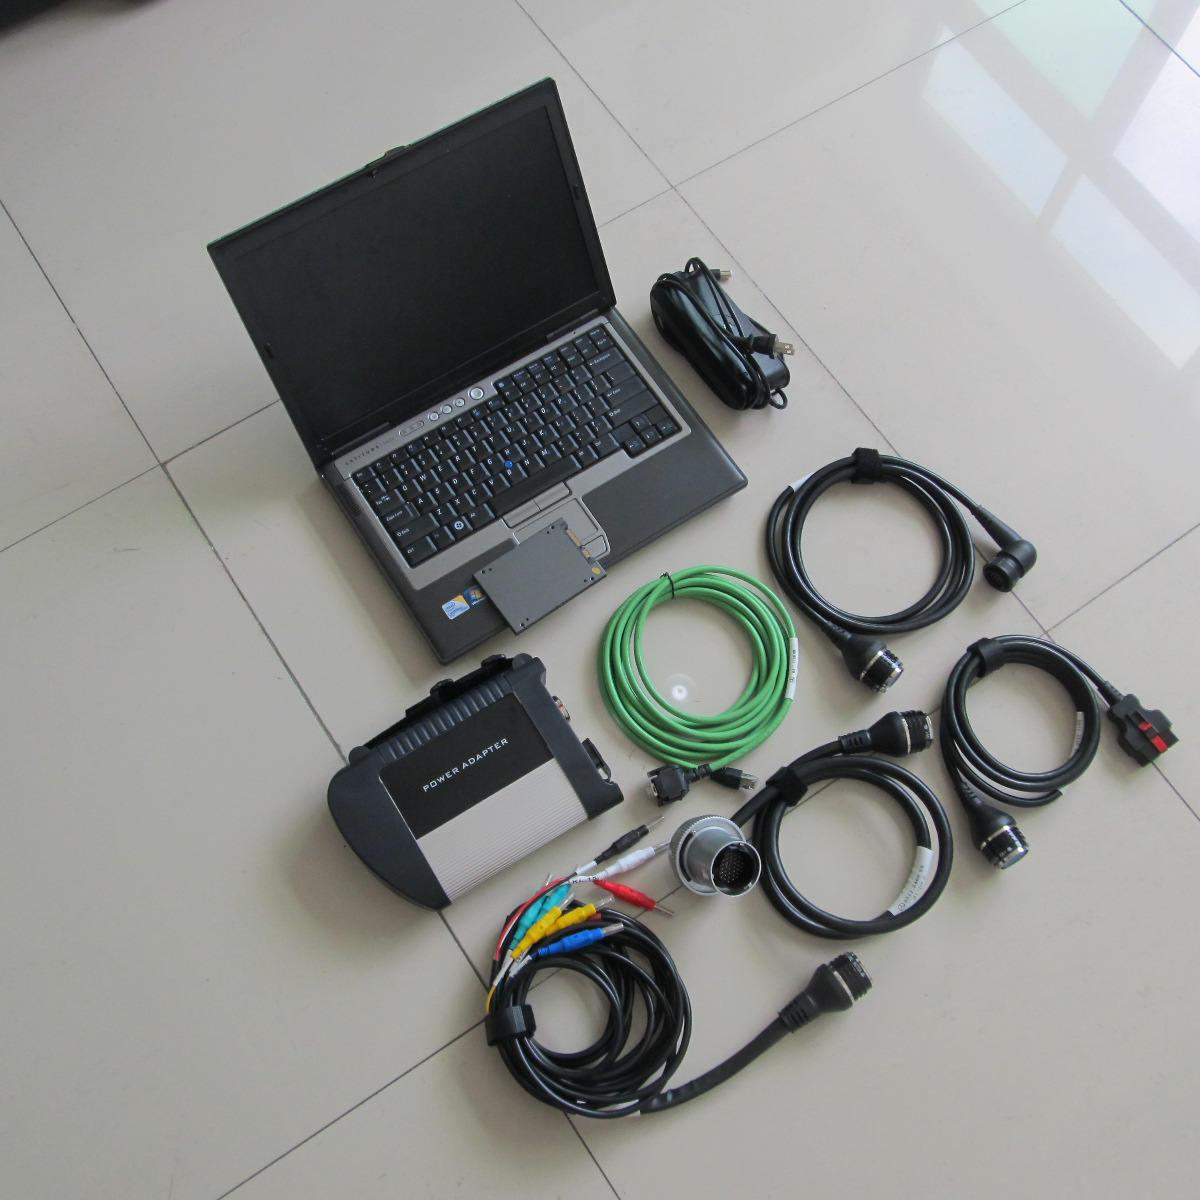 MB STAR SD Connect C4 Auto Diagnostic Tool con HDD 2021.06 in D630 Laptop Laptop Computer Lavori per lo scanner Diagnostici BZ